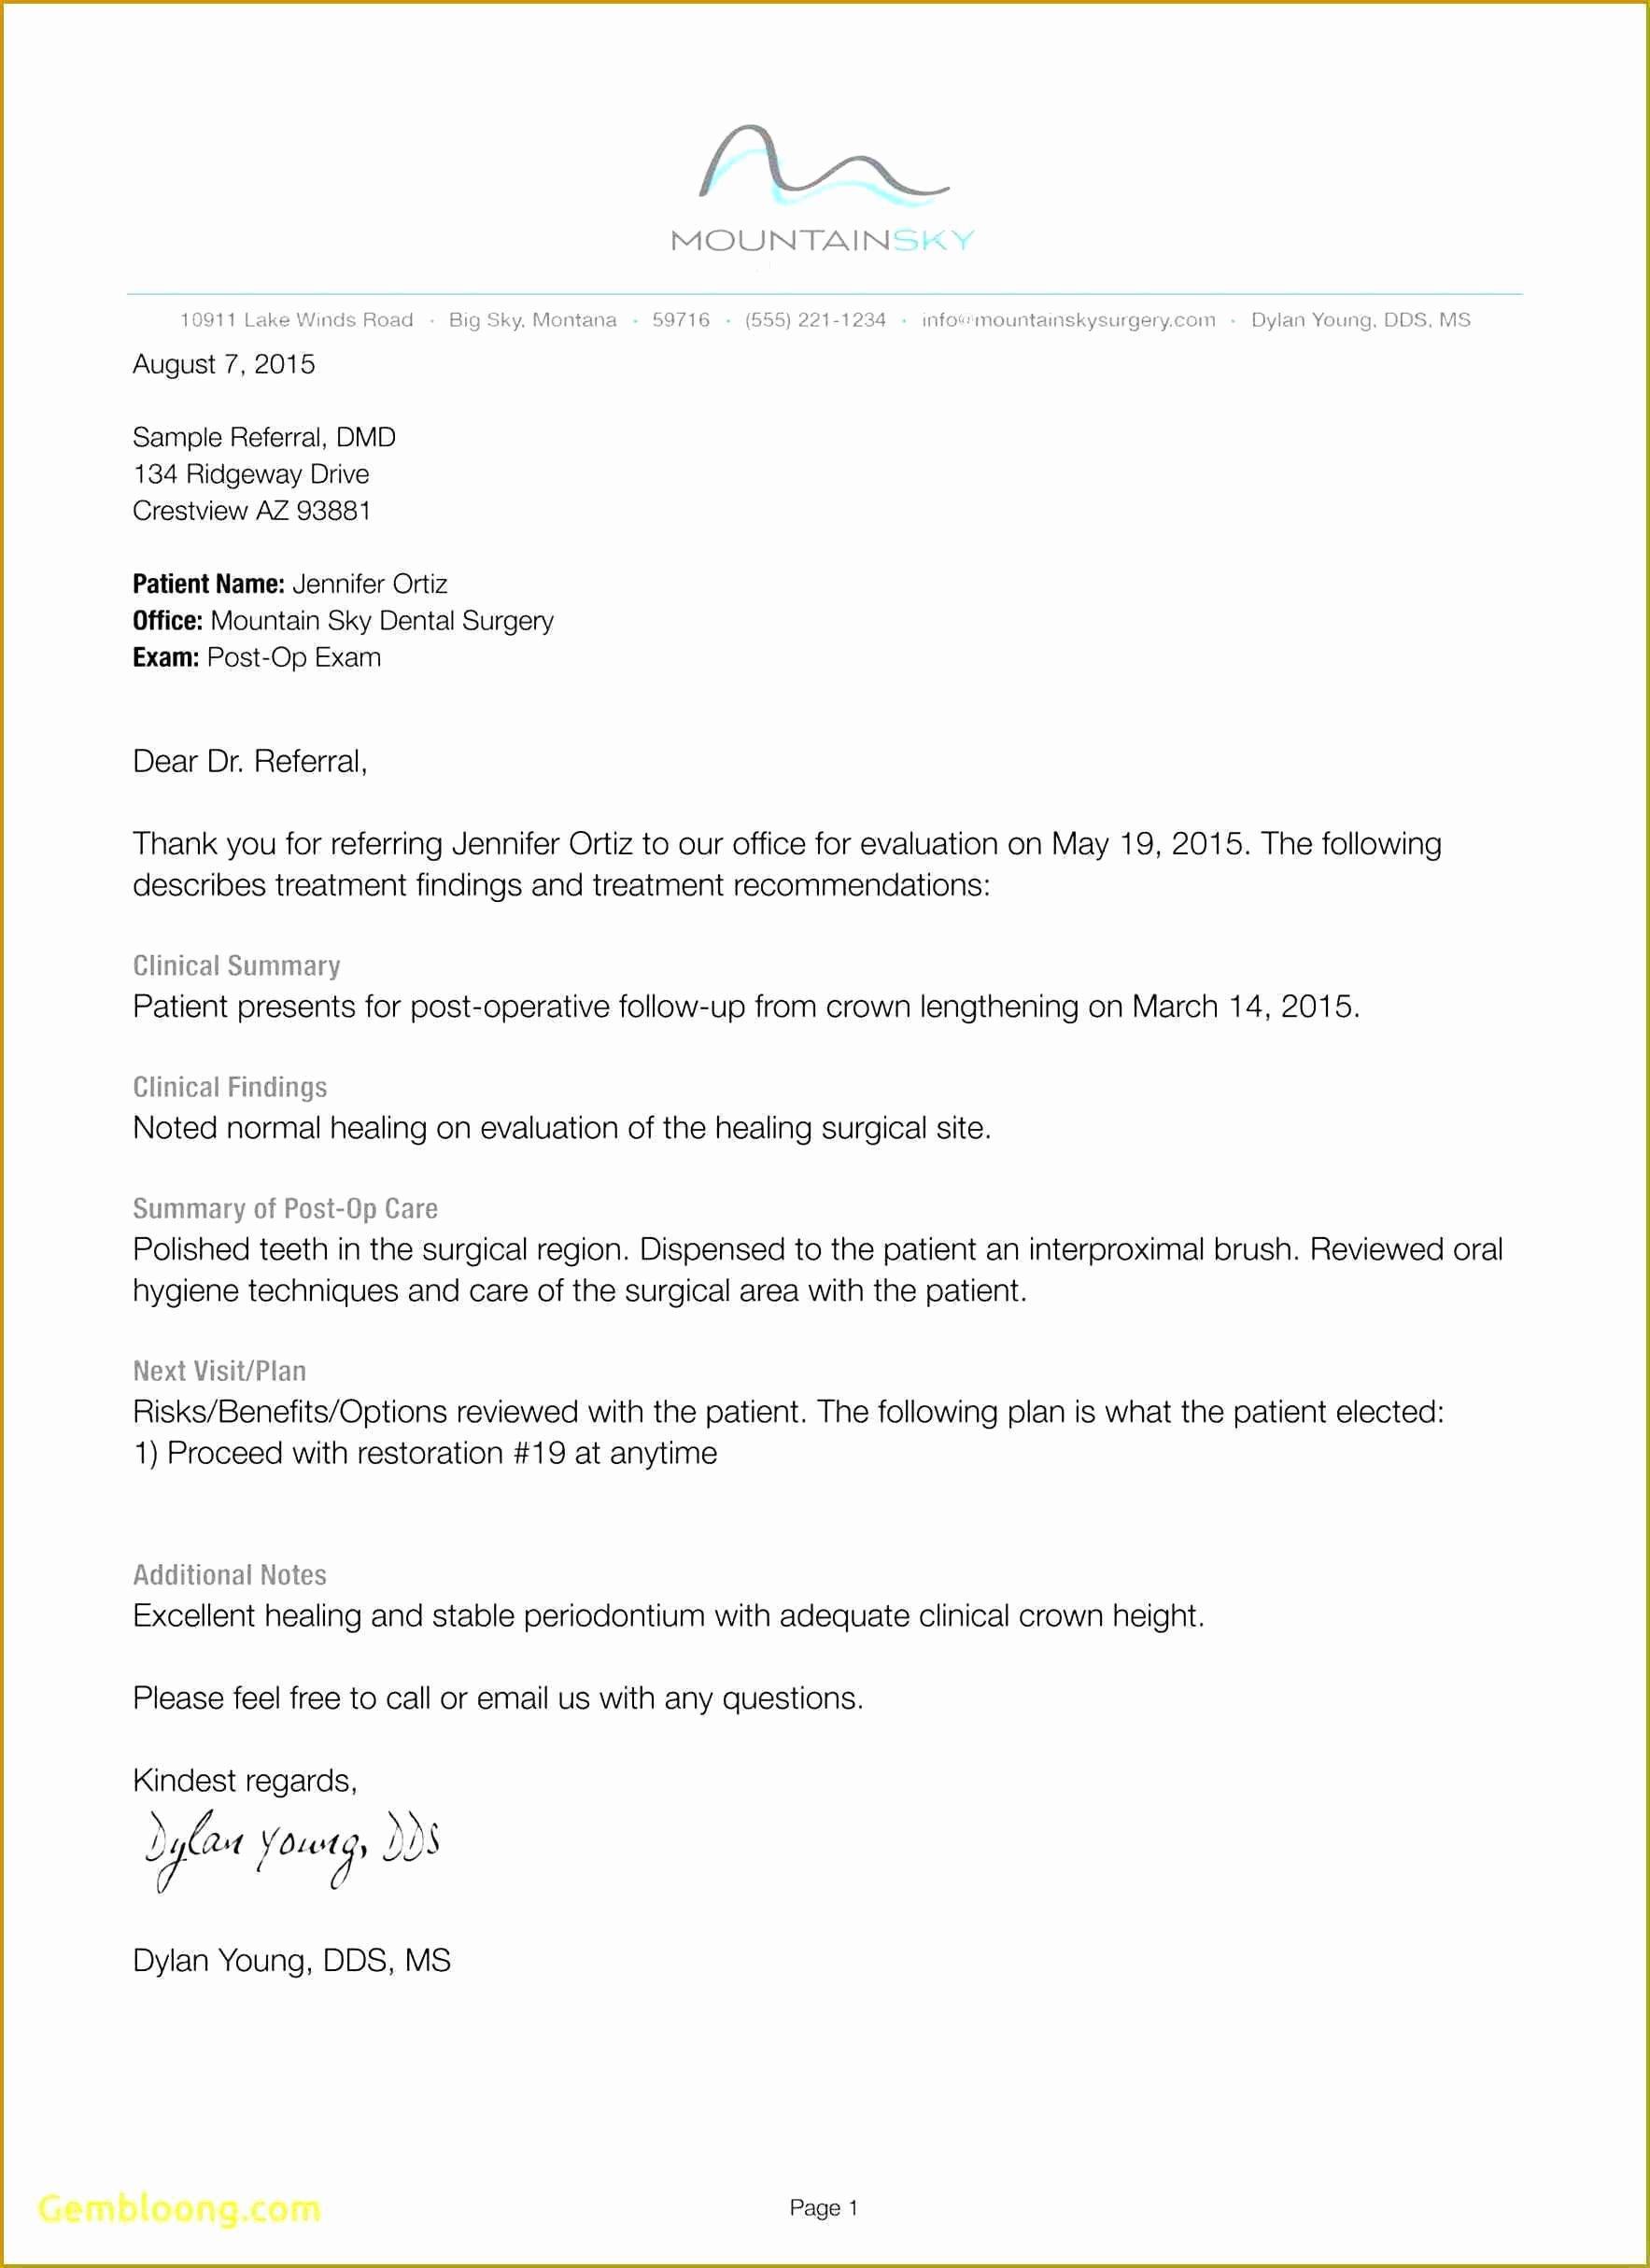 Fake Doctors Note Elegant Fake Doctors Note Template for Work or School Pdf